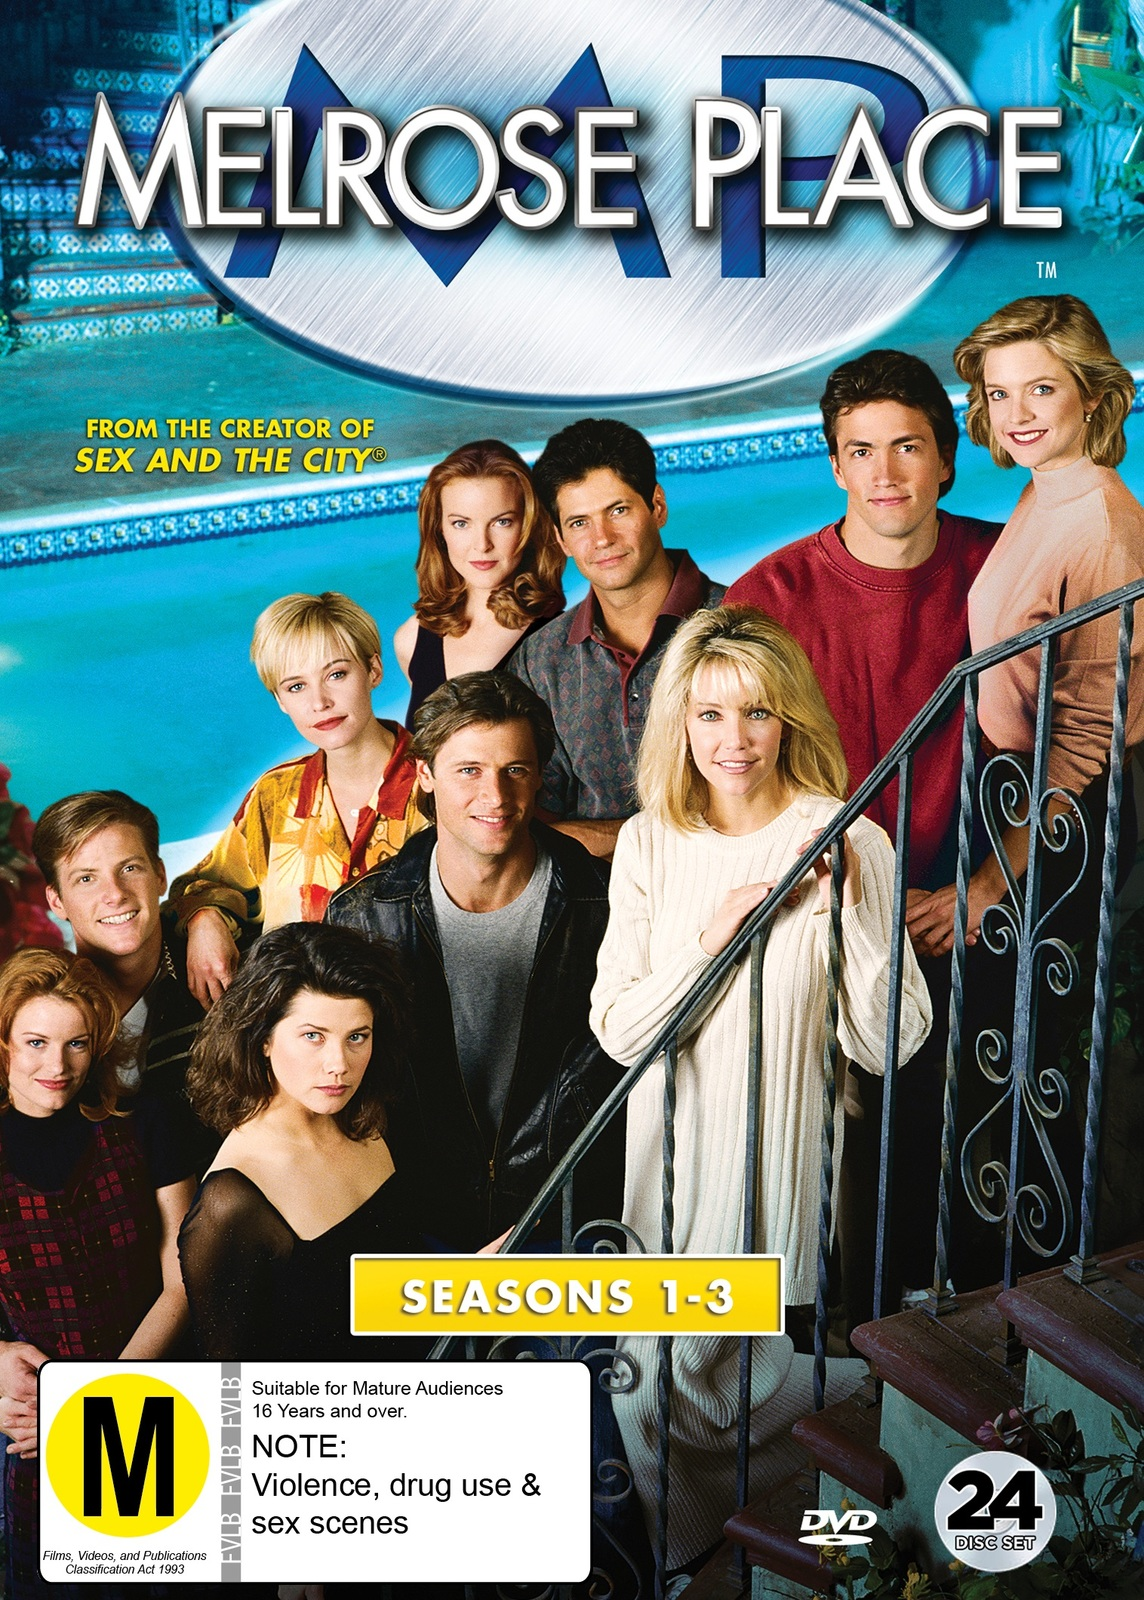 Melrose Place Seasons 1-3 on DVD image